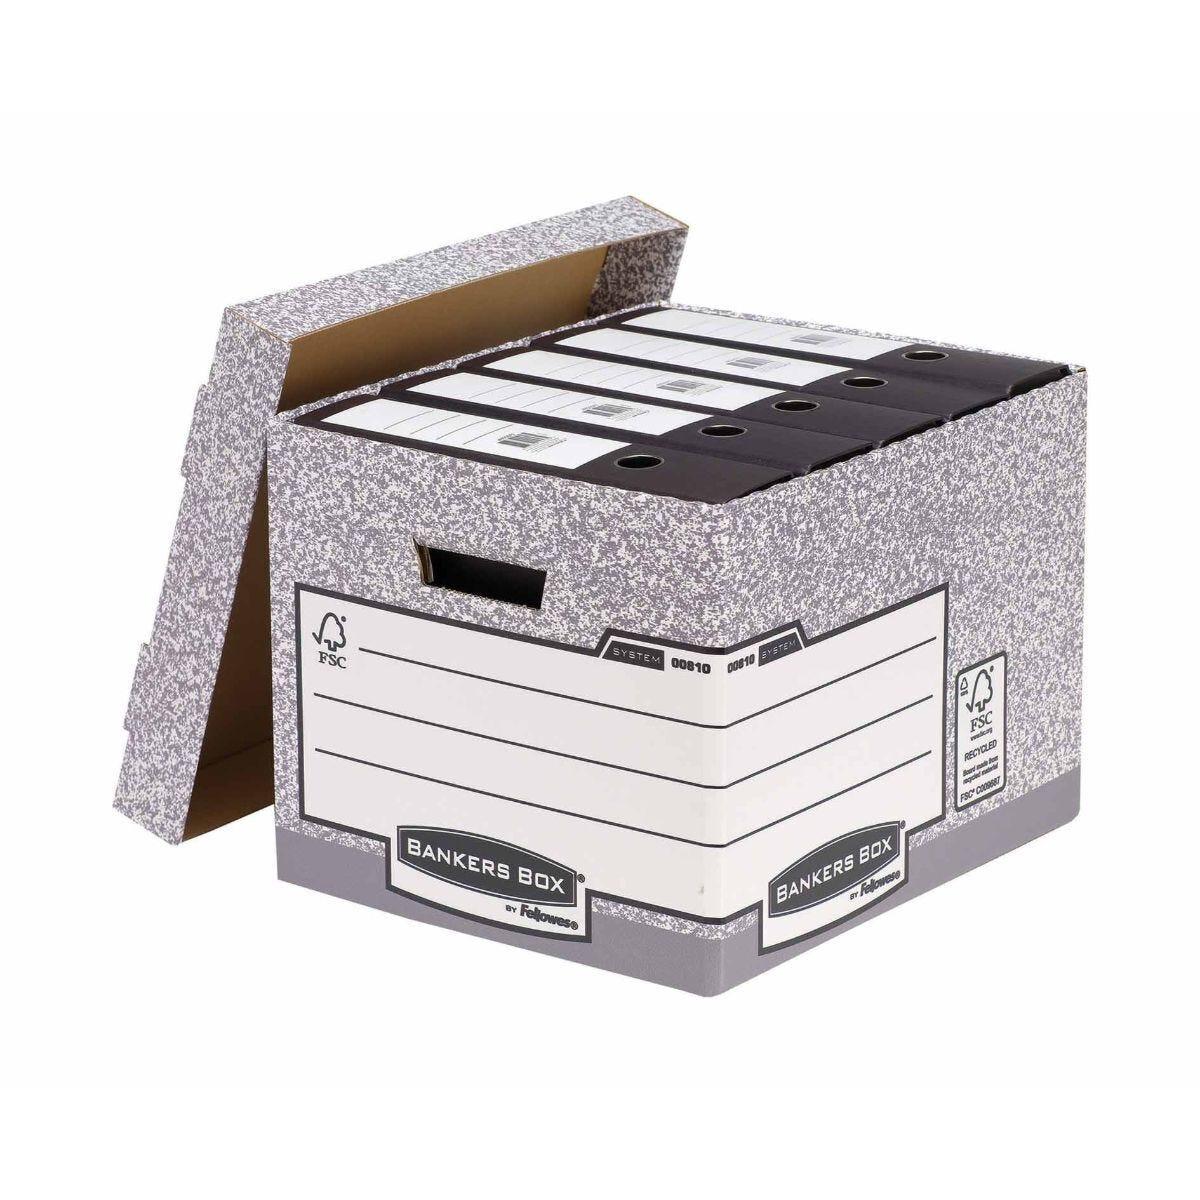 Fellowes Bankers Box Cardboard Storage Box Medium-Duty Pack of 10